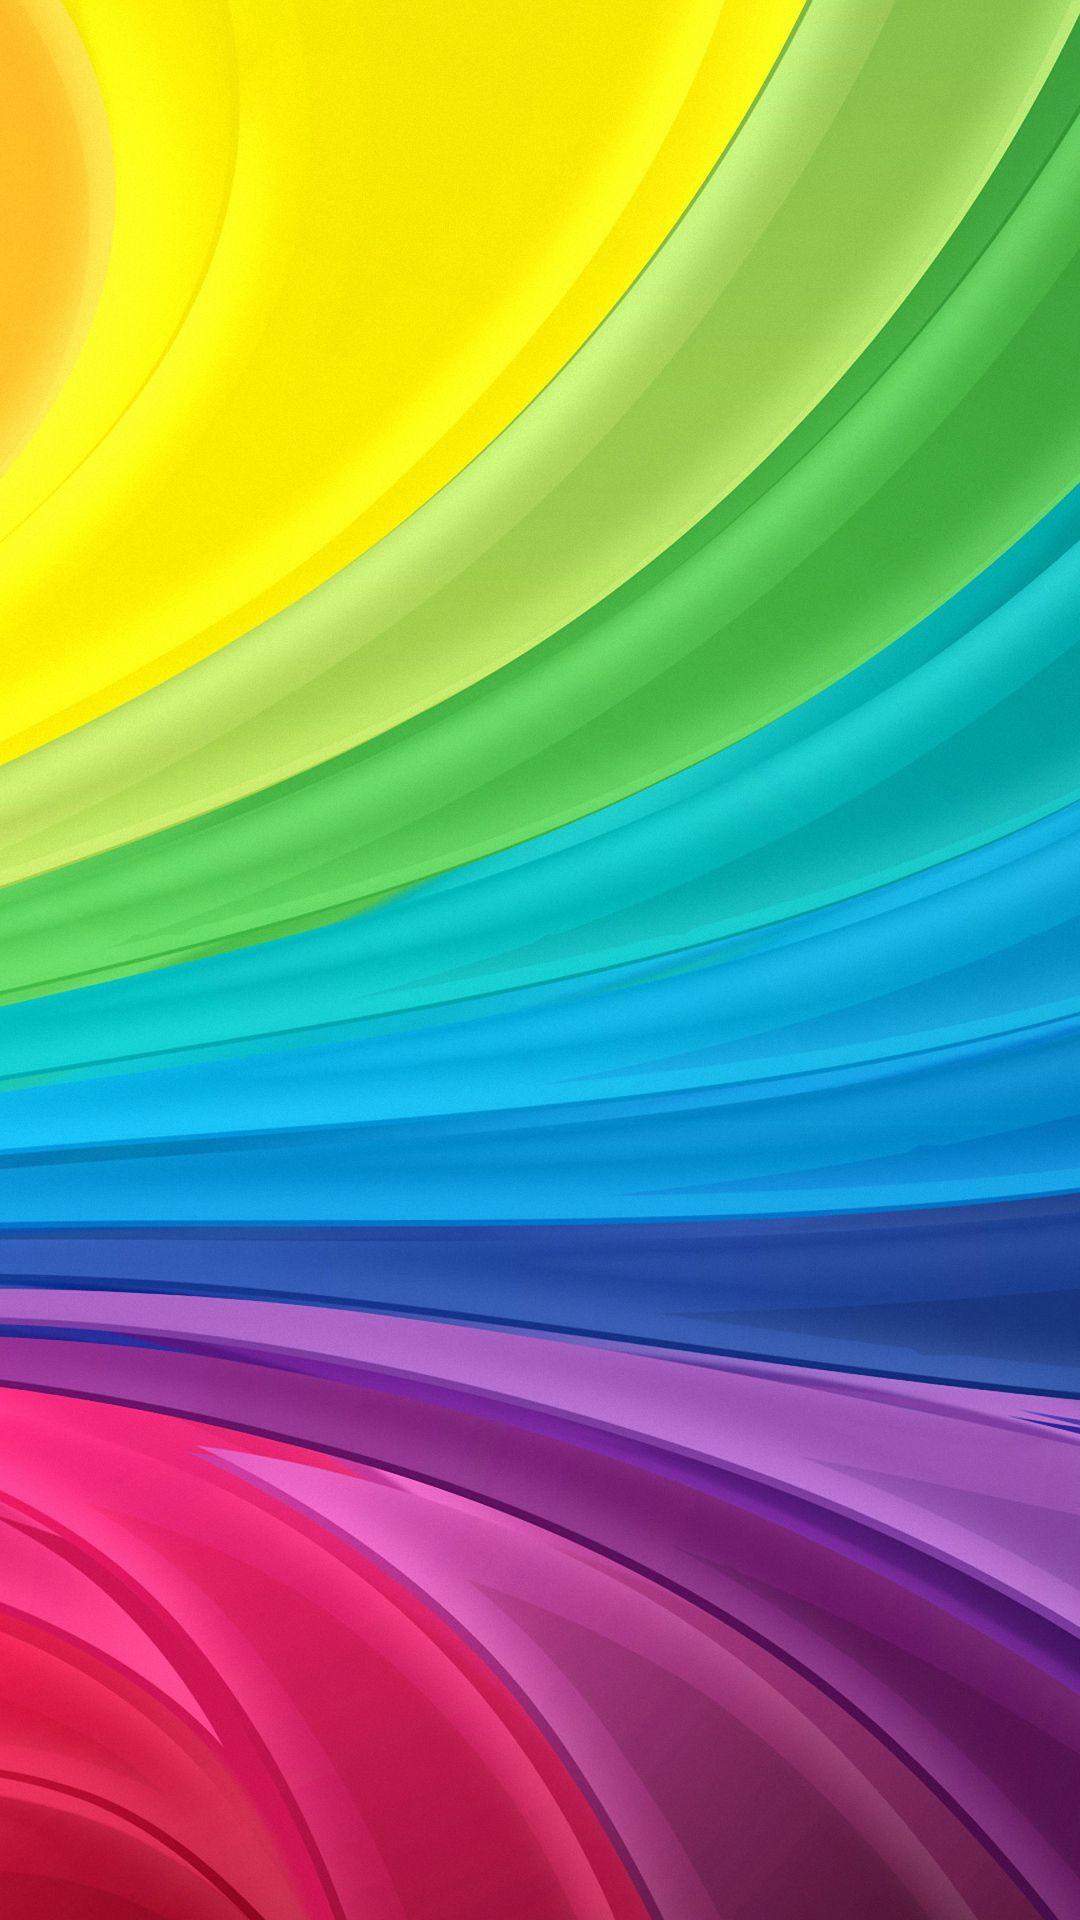 HD 1080x1920 rainbow swirl samsung galaxy a7 wallpapers Rainbow 1080x1920